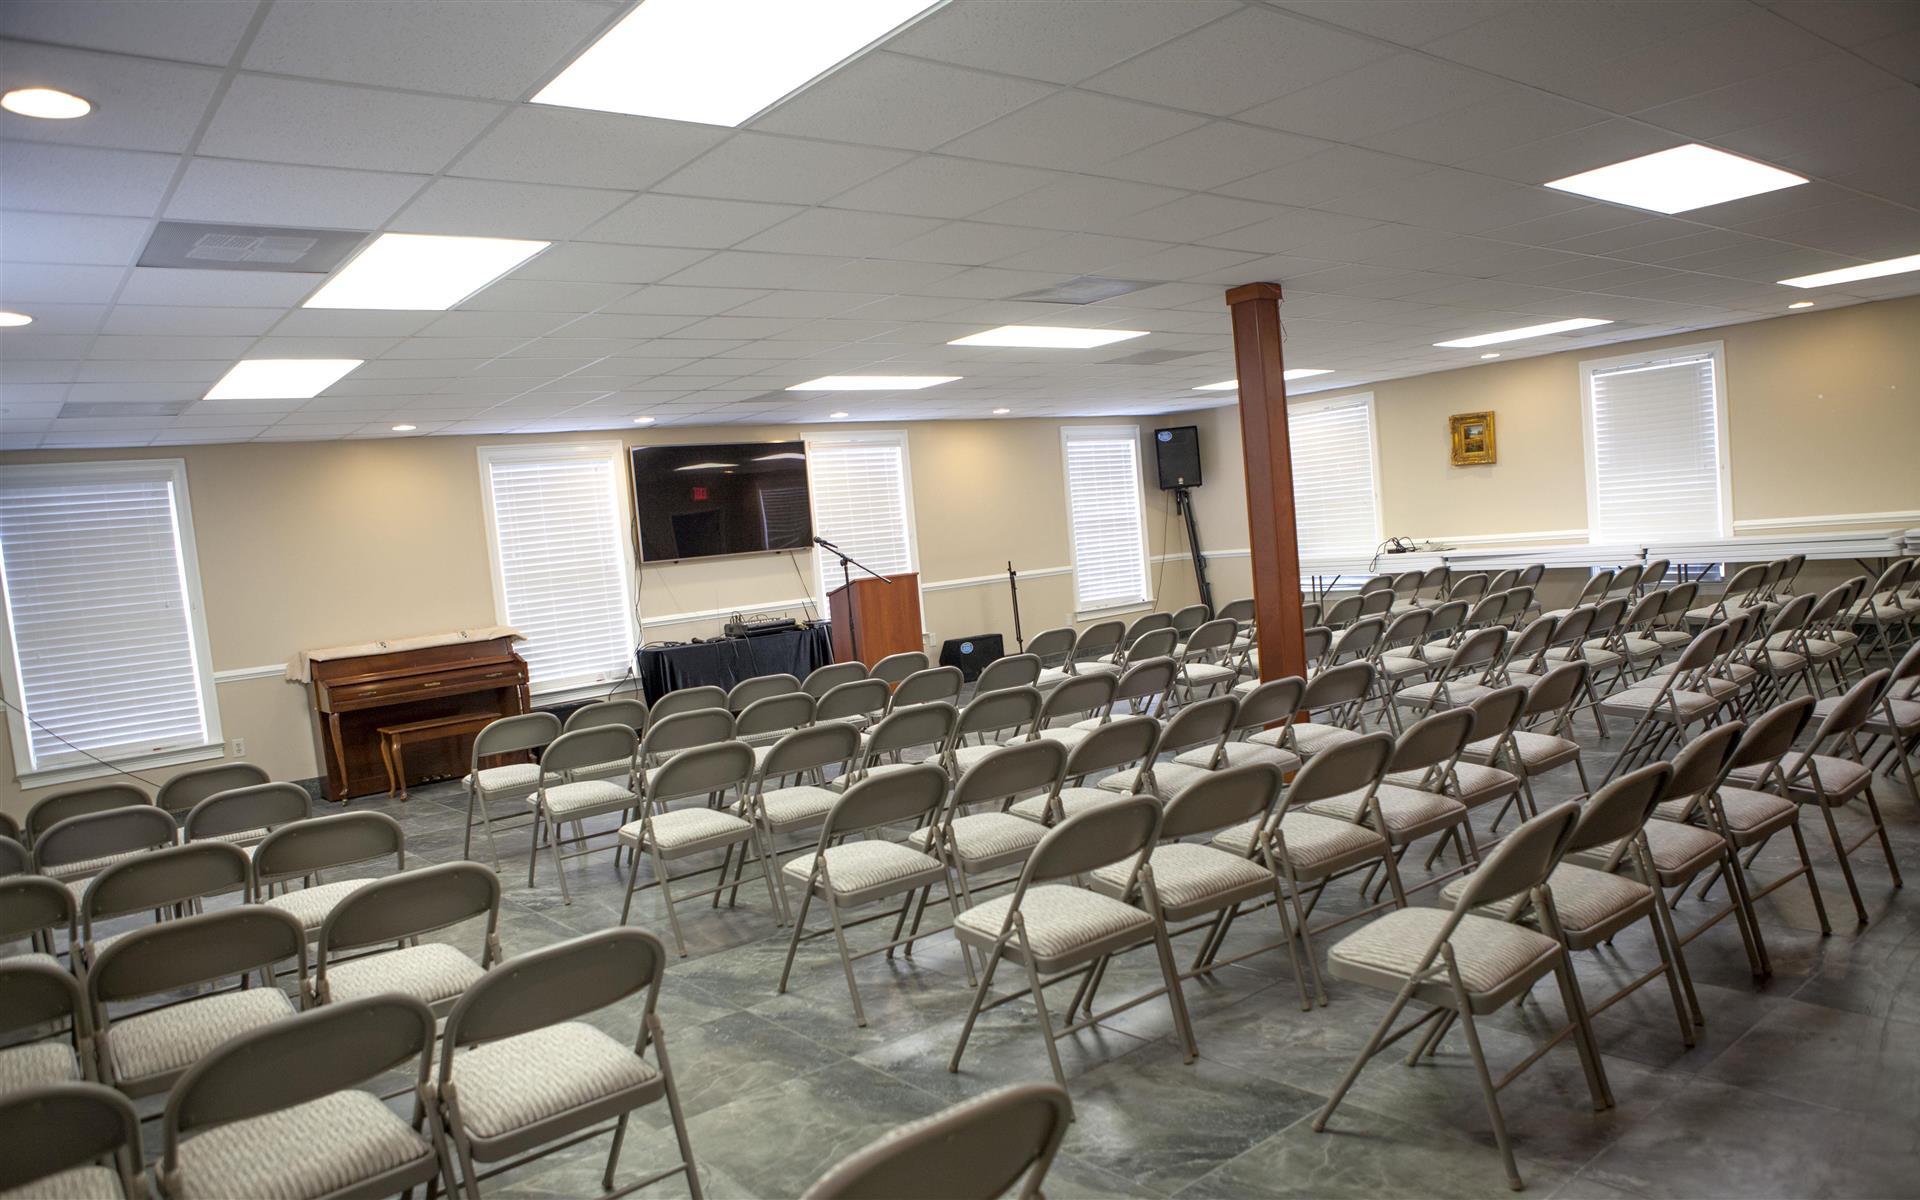 SATEL, LLC - Office/Training  Room / 1,600 sq ft